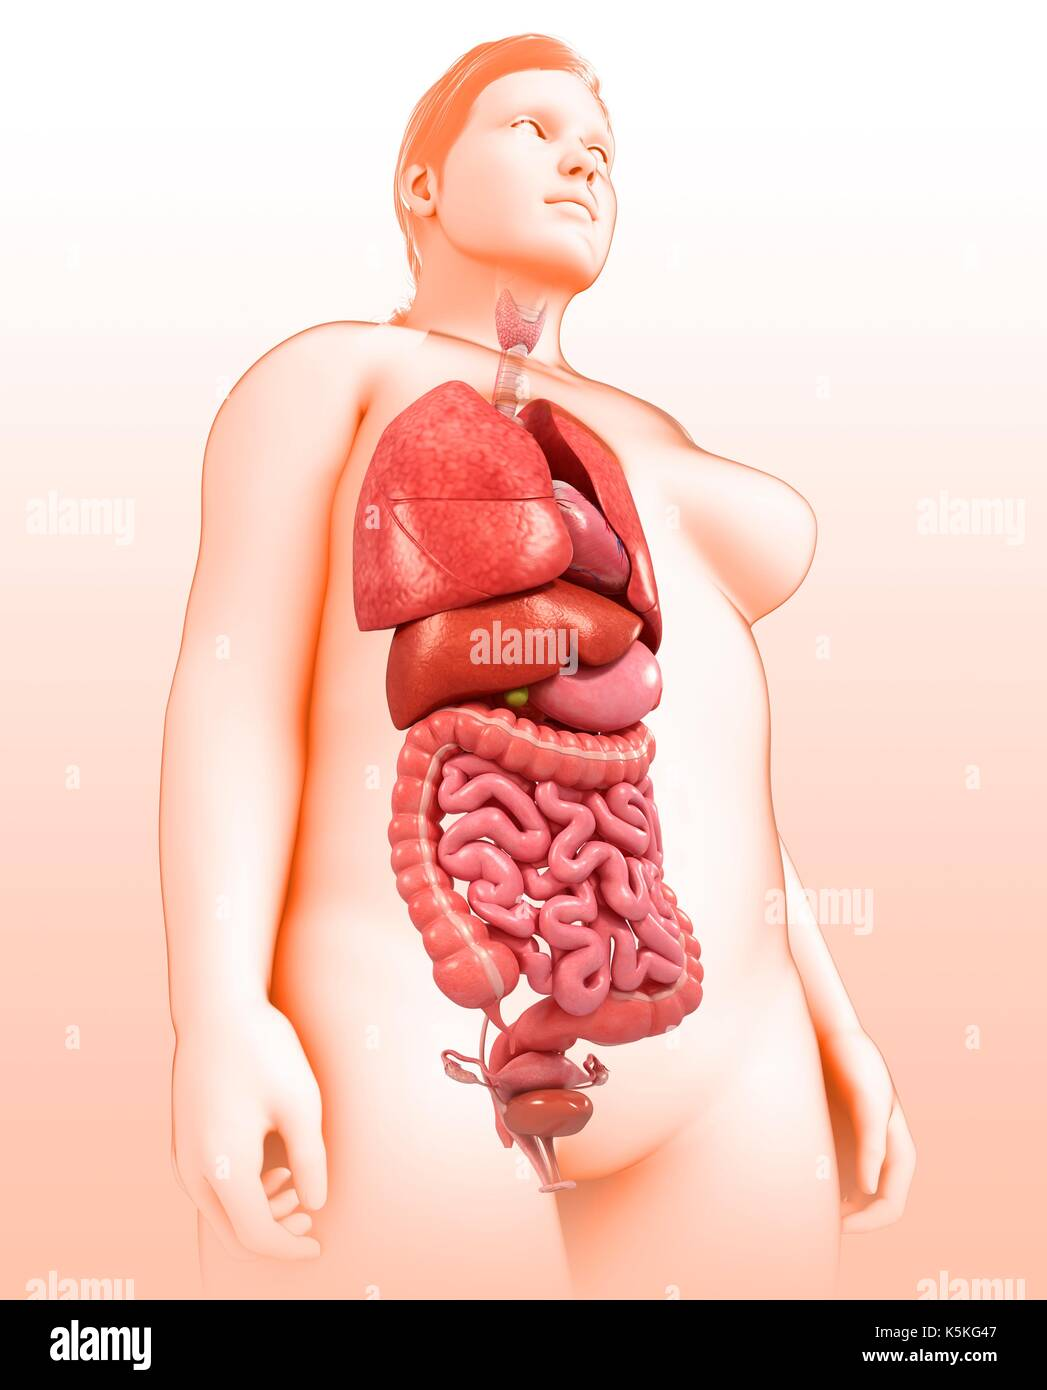 Illustration Of Female Body Organs Stock Photo 158396343 Alamy